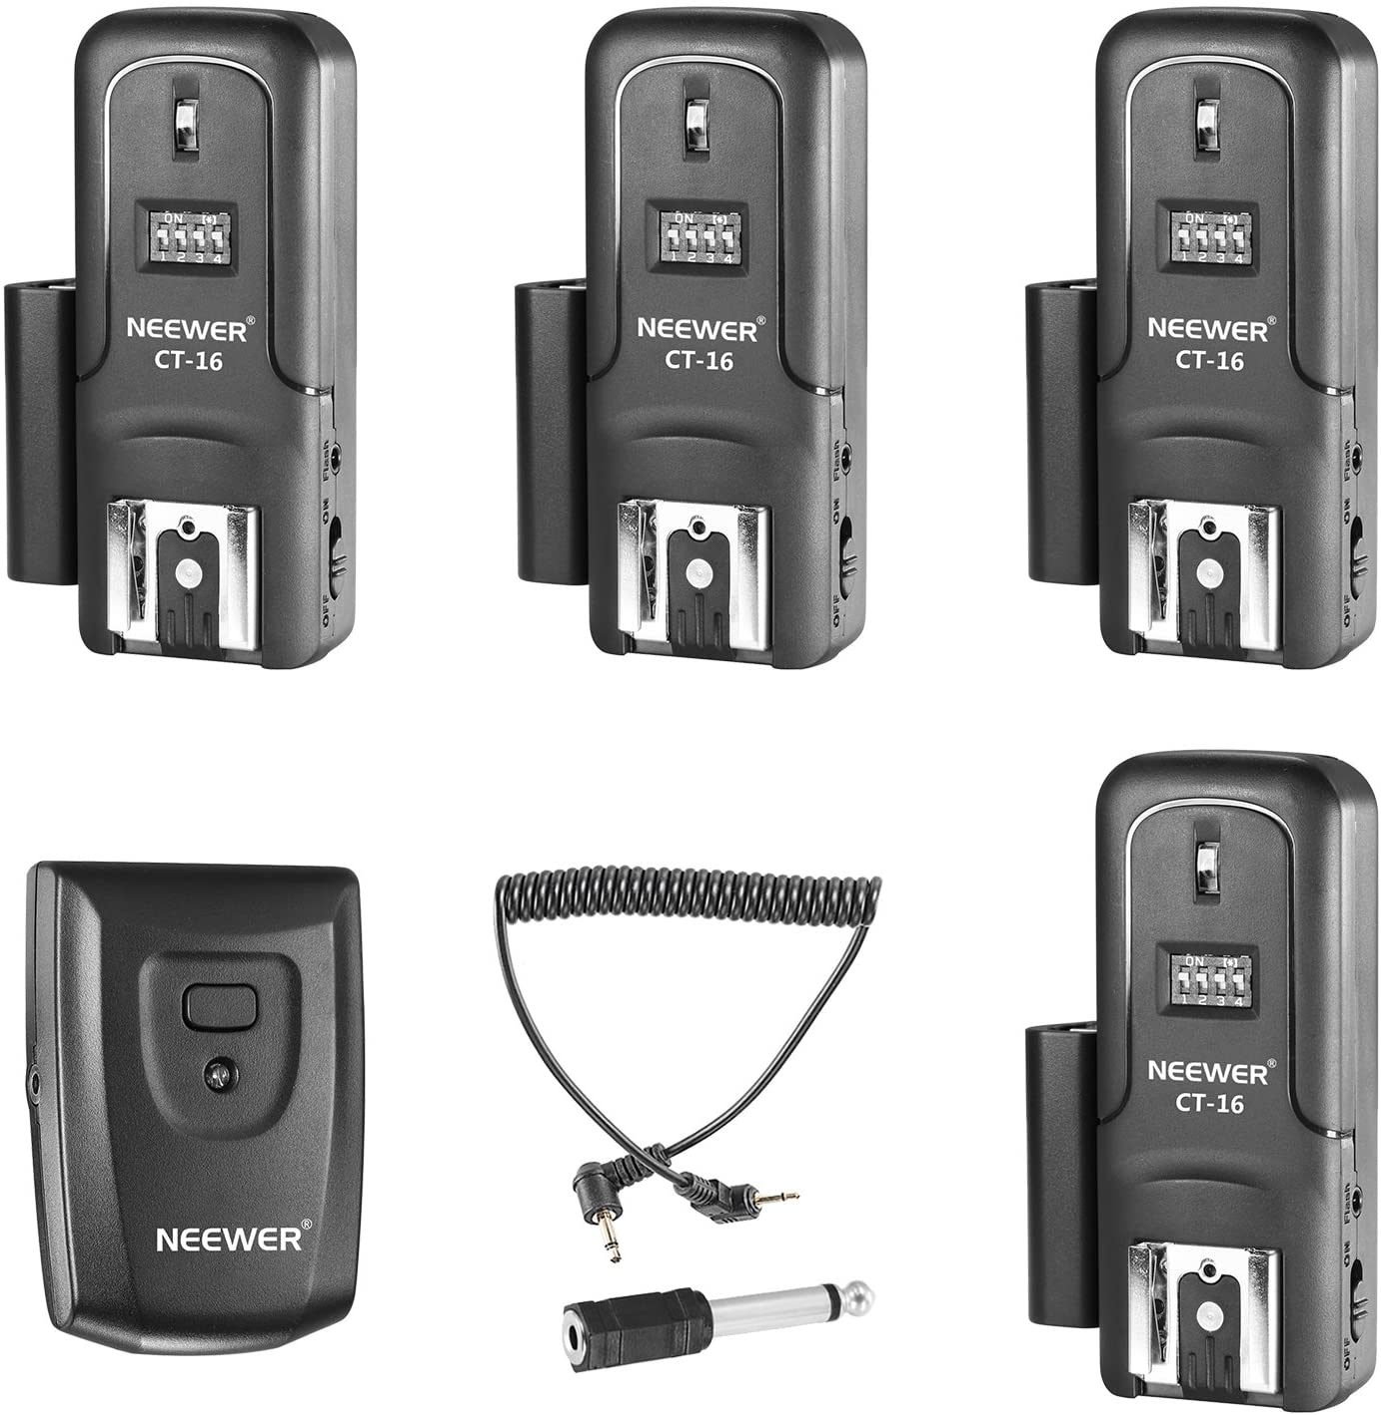 Neewer 16 Canal Inalámbricos Radio Set de Disparador de flash Speedlite,Incluyendo (1)Transmisor(4)Receptores Ajuste para Canon Nikon Pentax Olympus Panasonic DSLR Cámaras (CT-16)